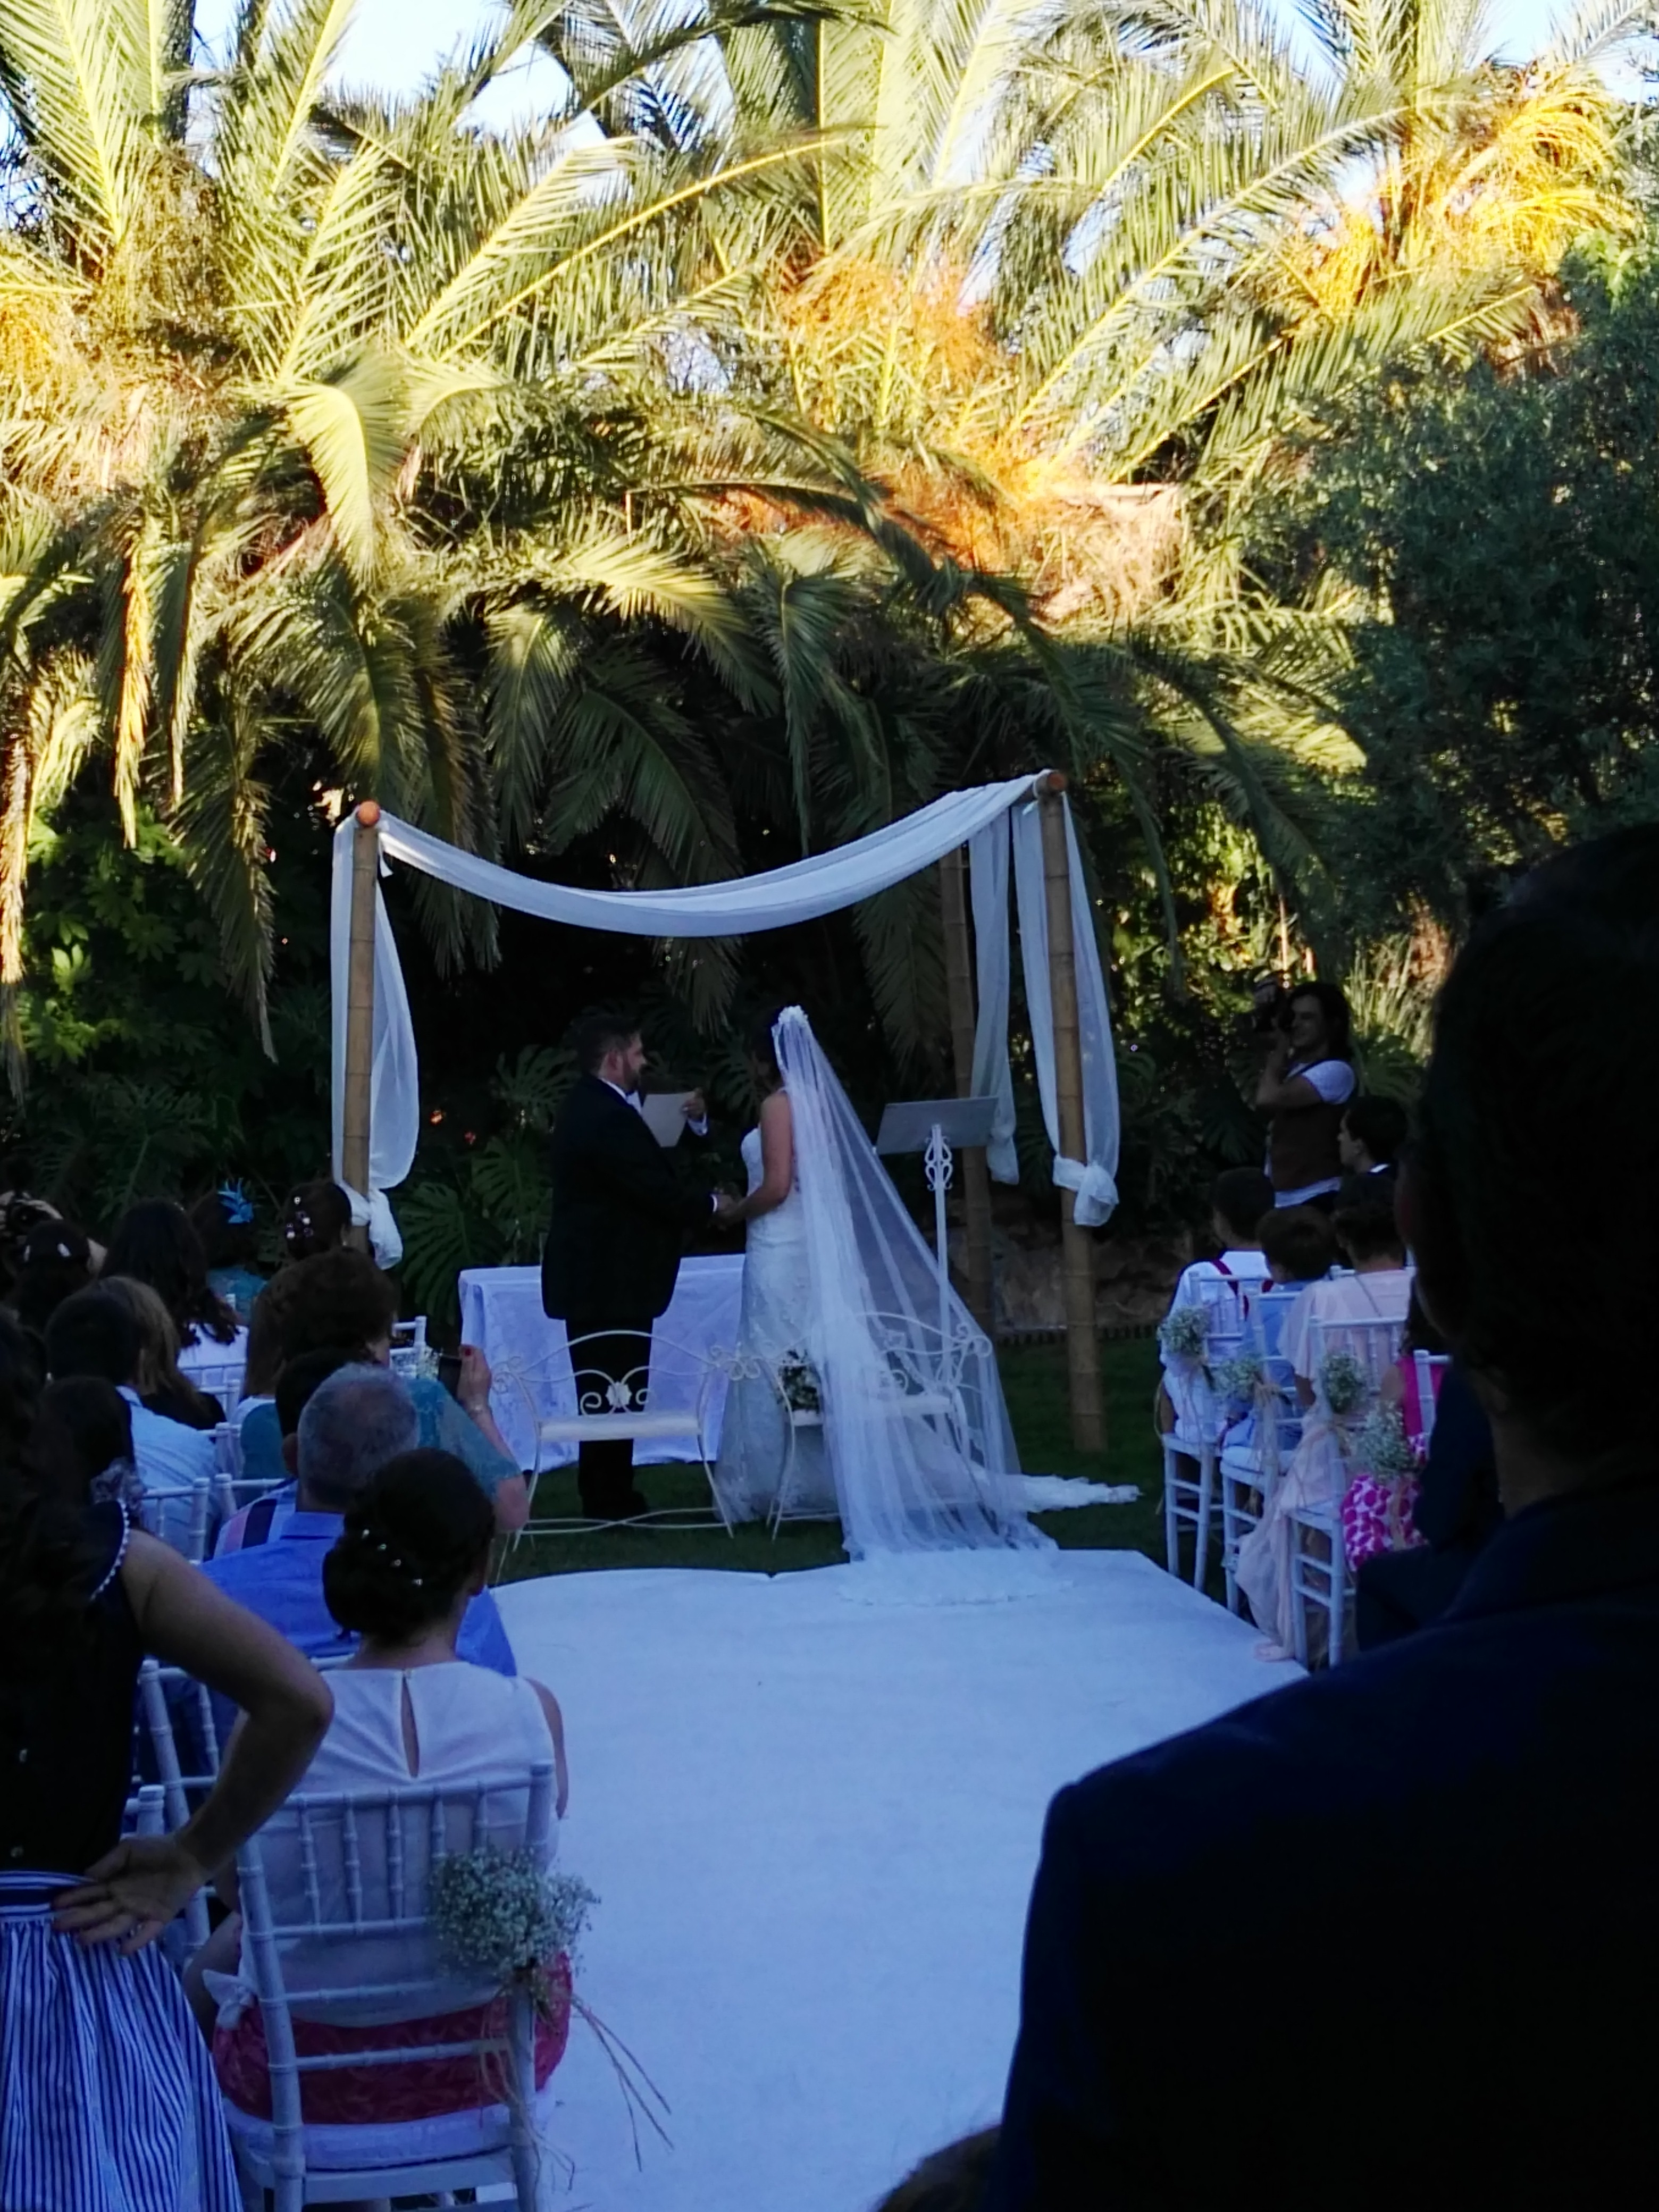 sitio italiano experiencia de novia cerca de Córdoba